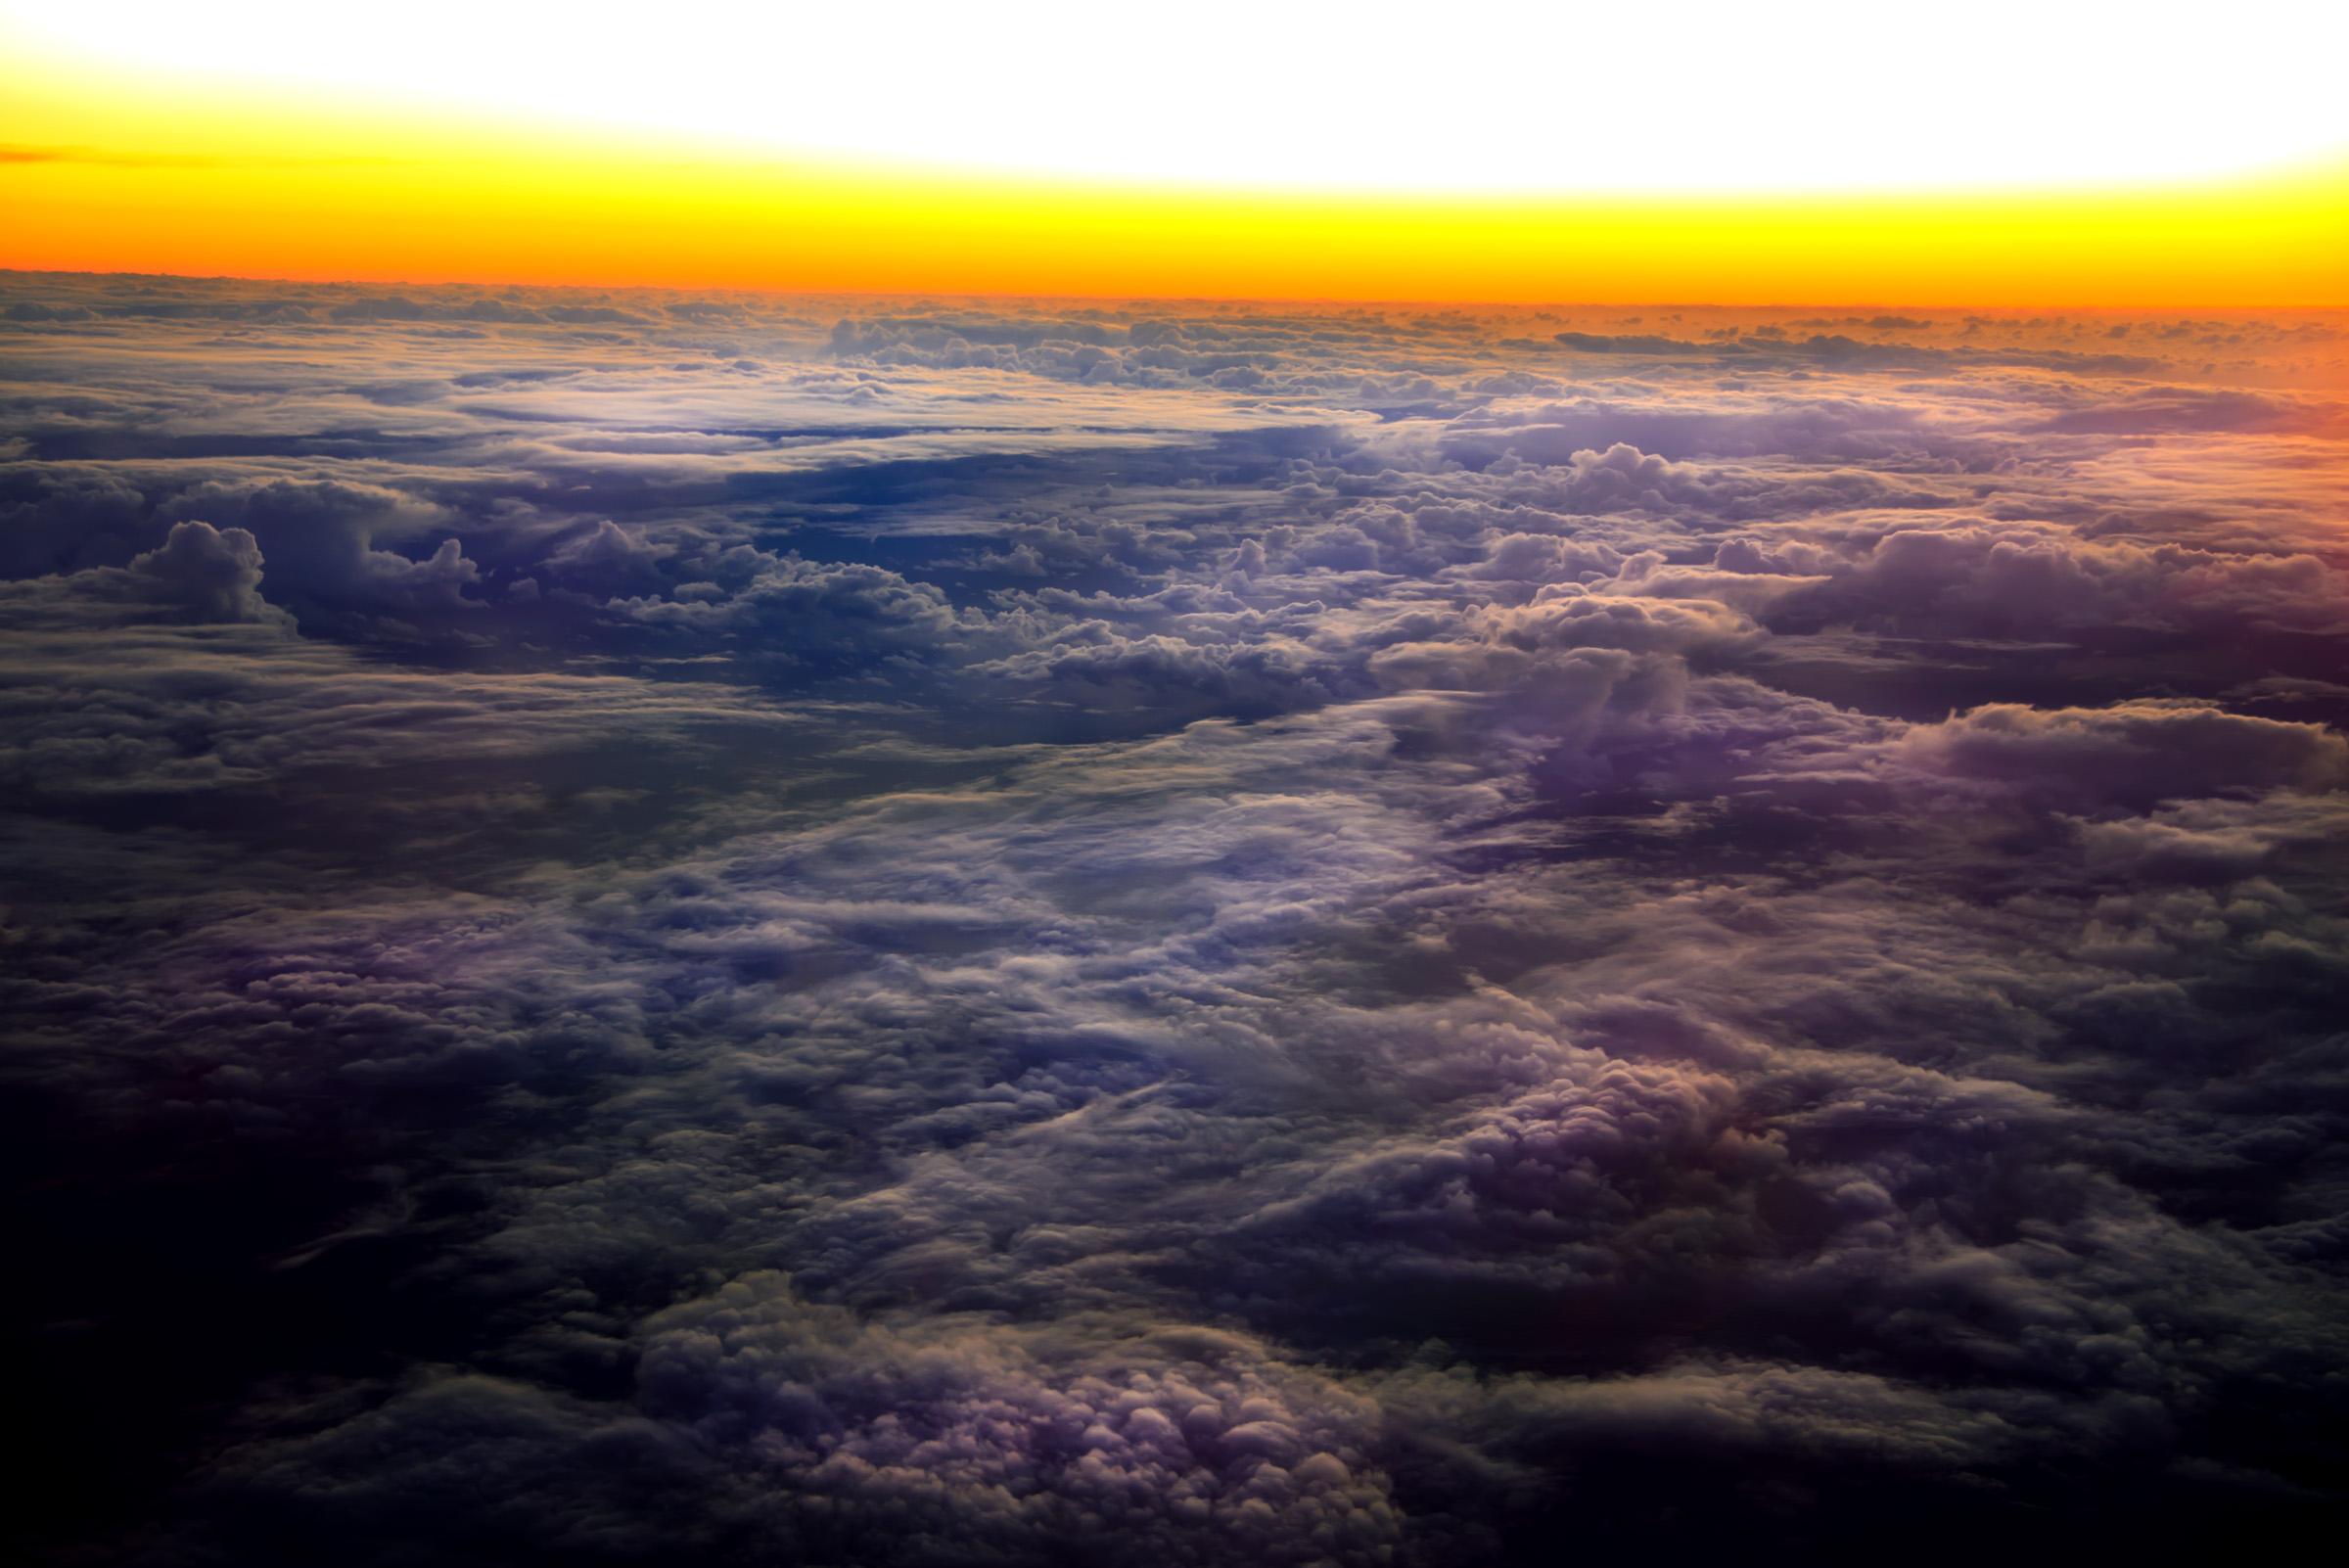 Day347_Sunrise at40,000 feet_Dec 13